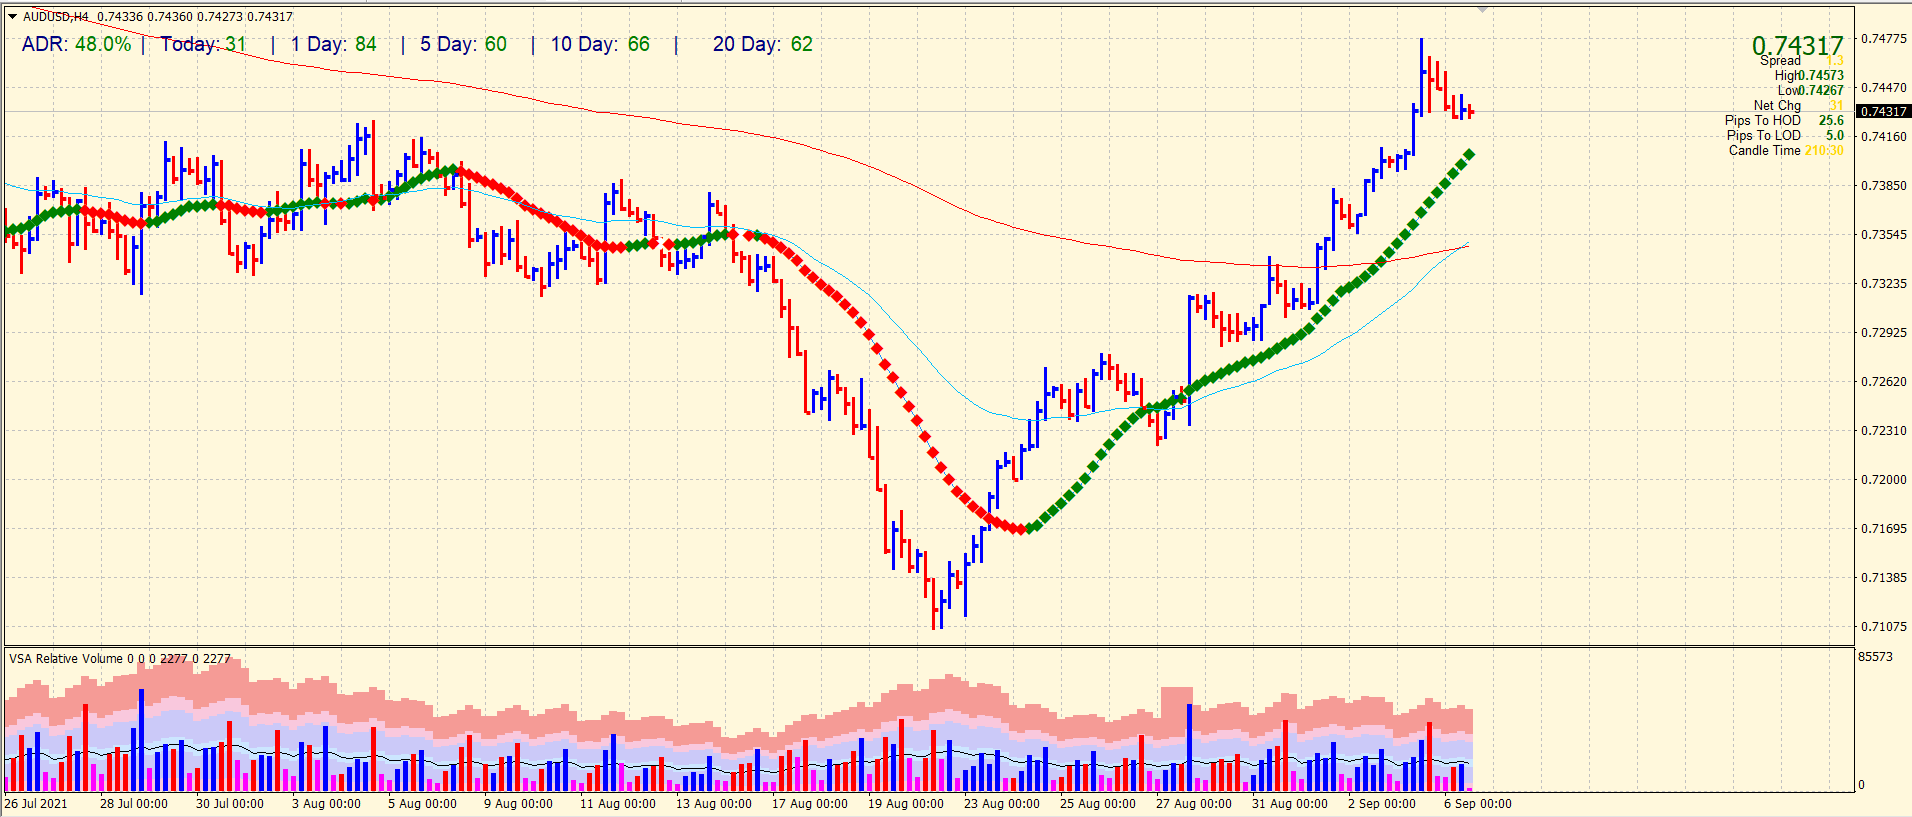 AUD/USD 4-hour price chart analysis